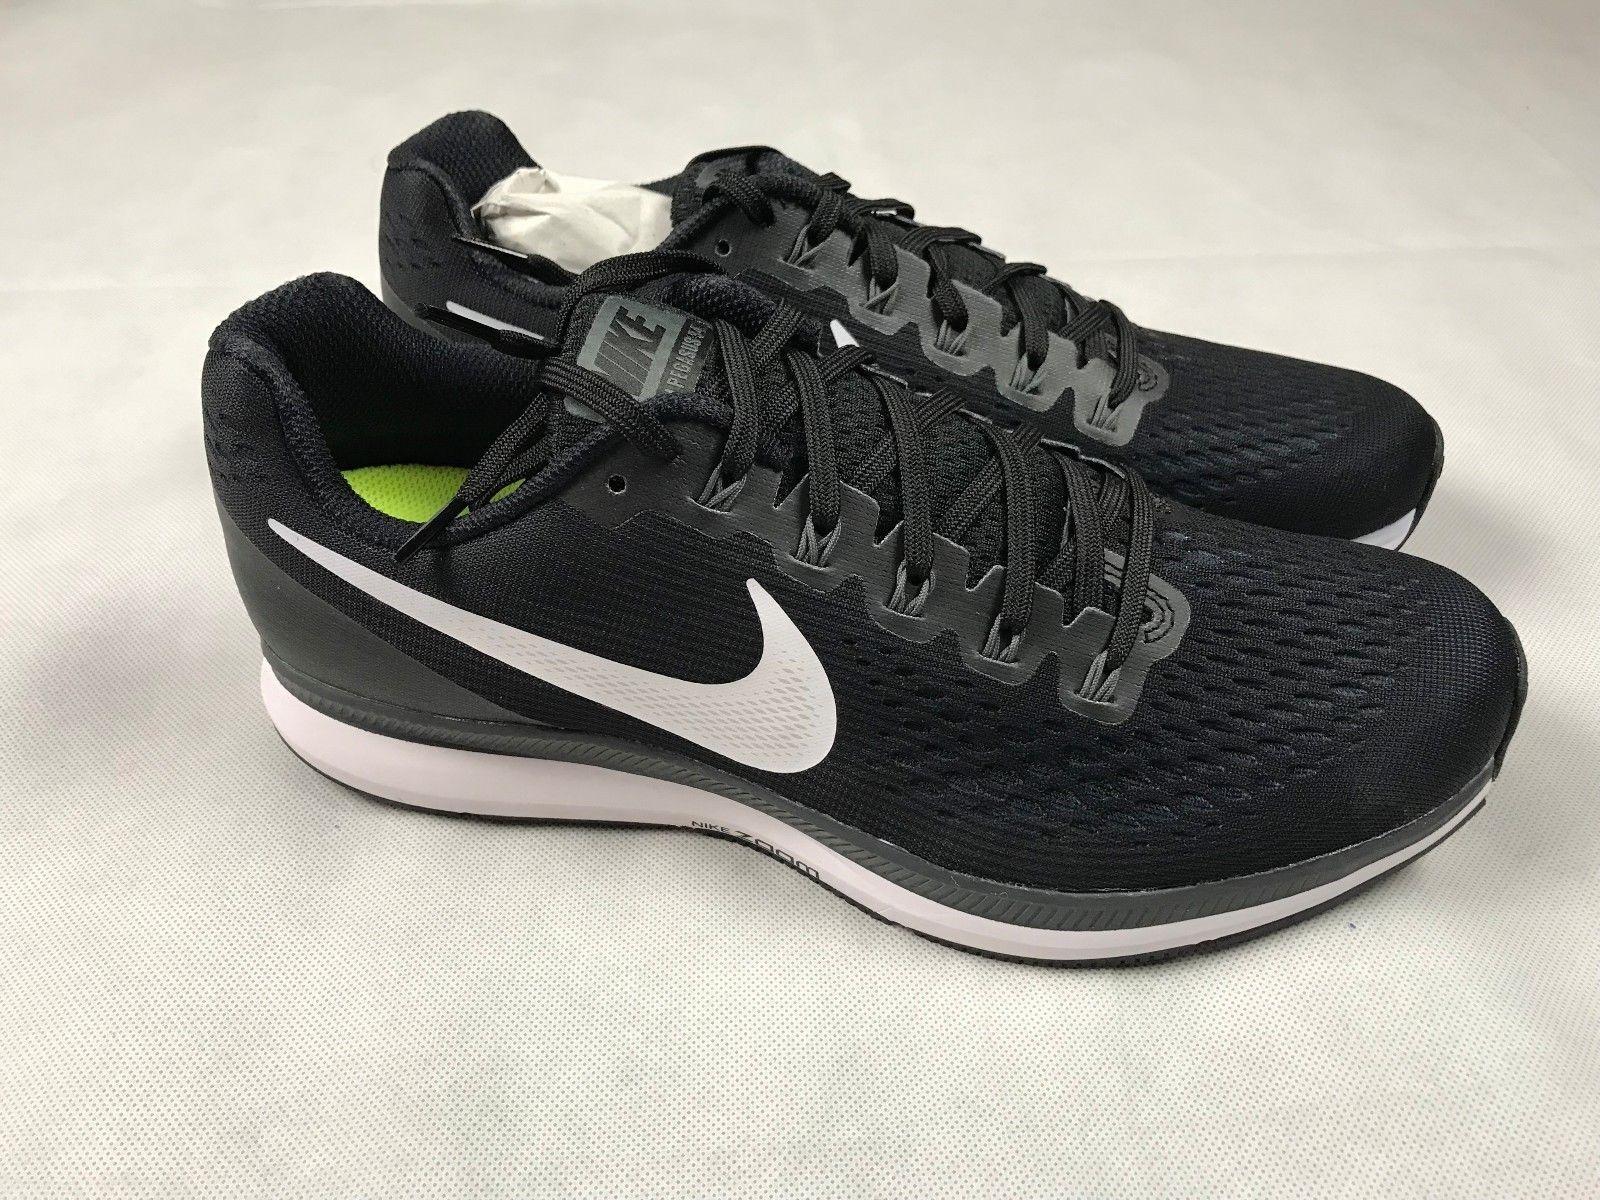 Nike Women's Air Zoom Pegasus 34 Black White Grey 880560-001 Sz 9.5 New